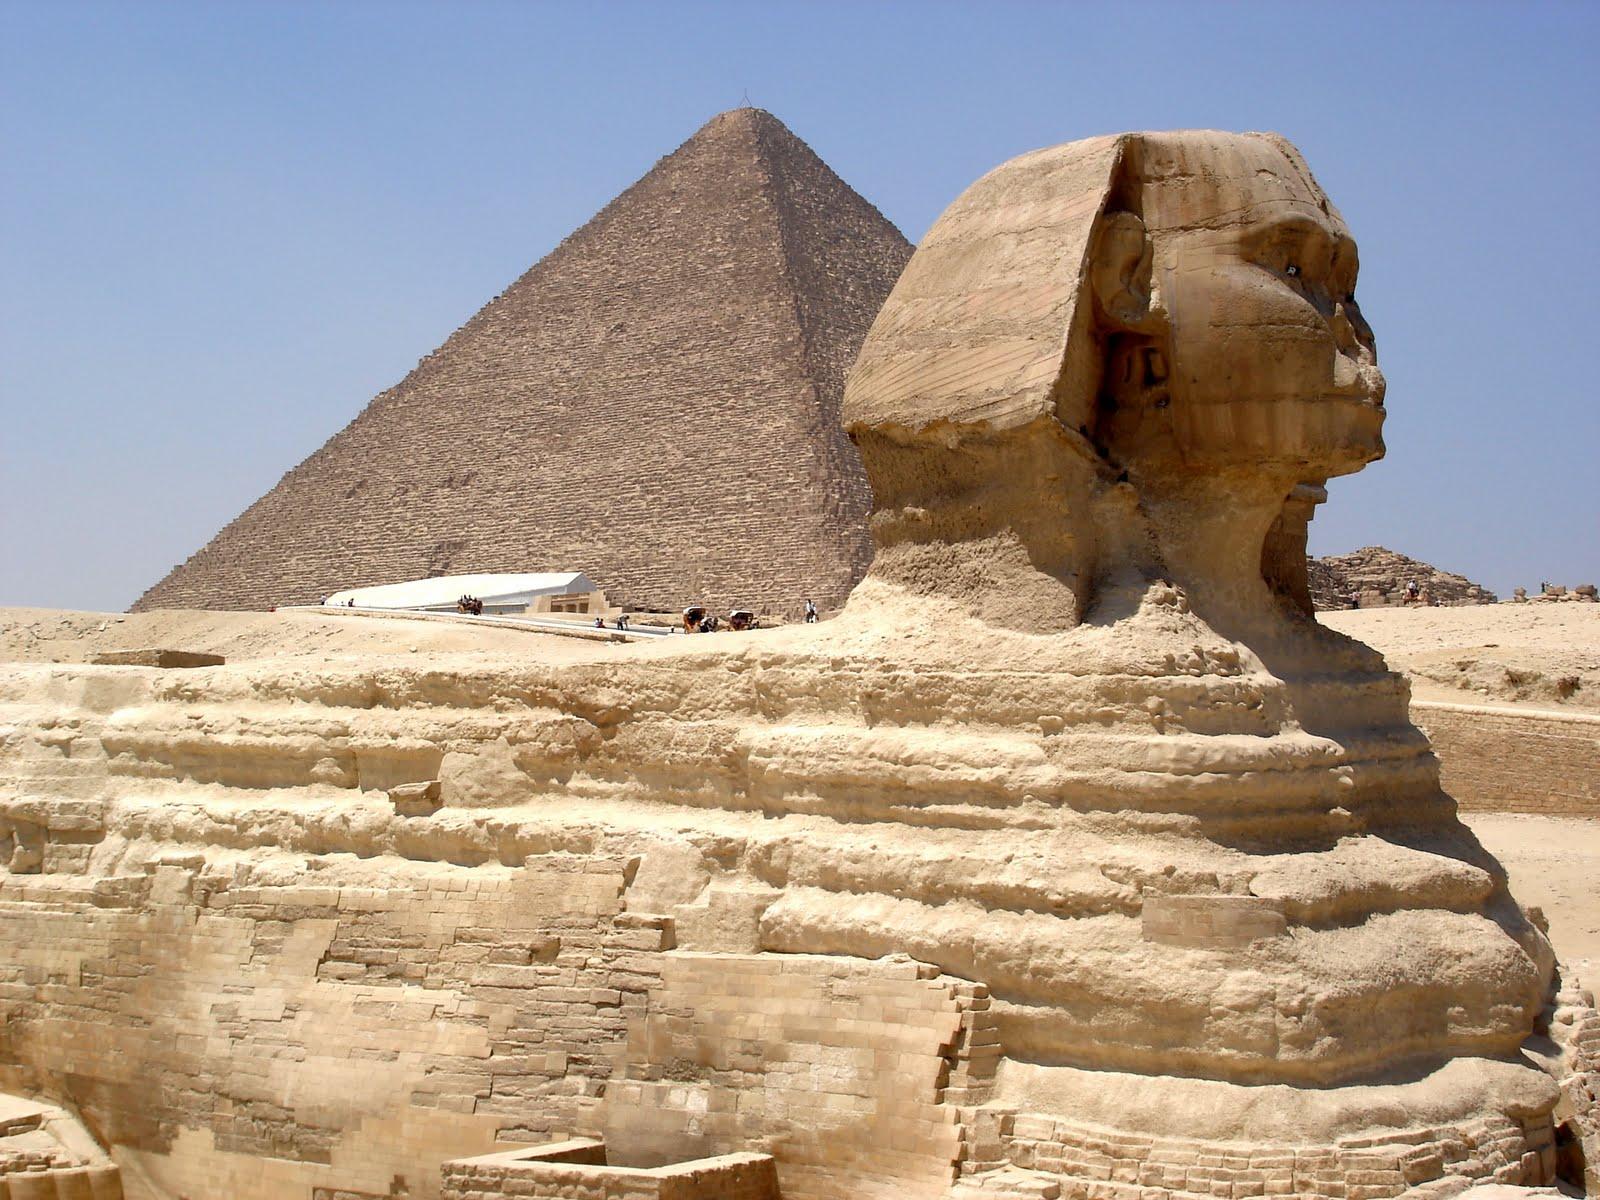 http://2.bp.blogspot.com/-lm11uzYowMQ/TgMCAeUco9I/AAAAAAAABuU/Il9a0hrNPT4/s1600/94-places_egypt_pyramids_wallpaper.jpg